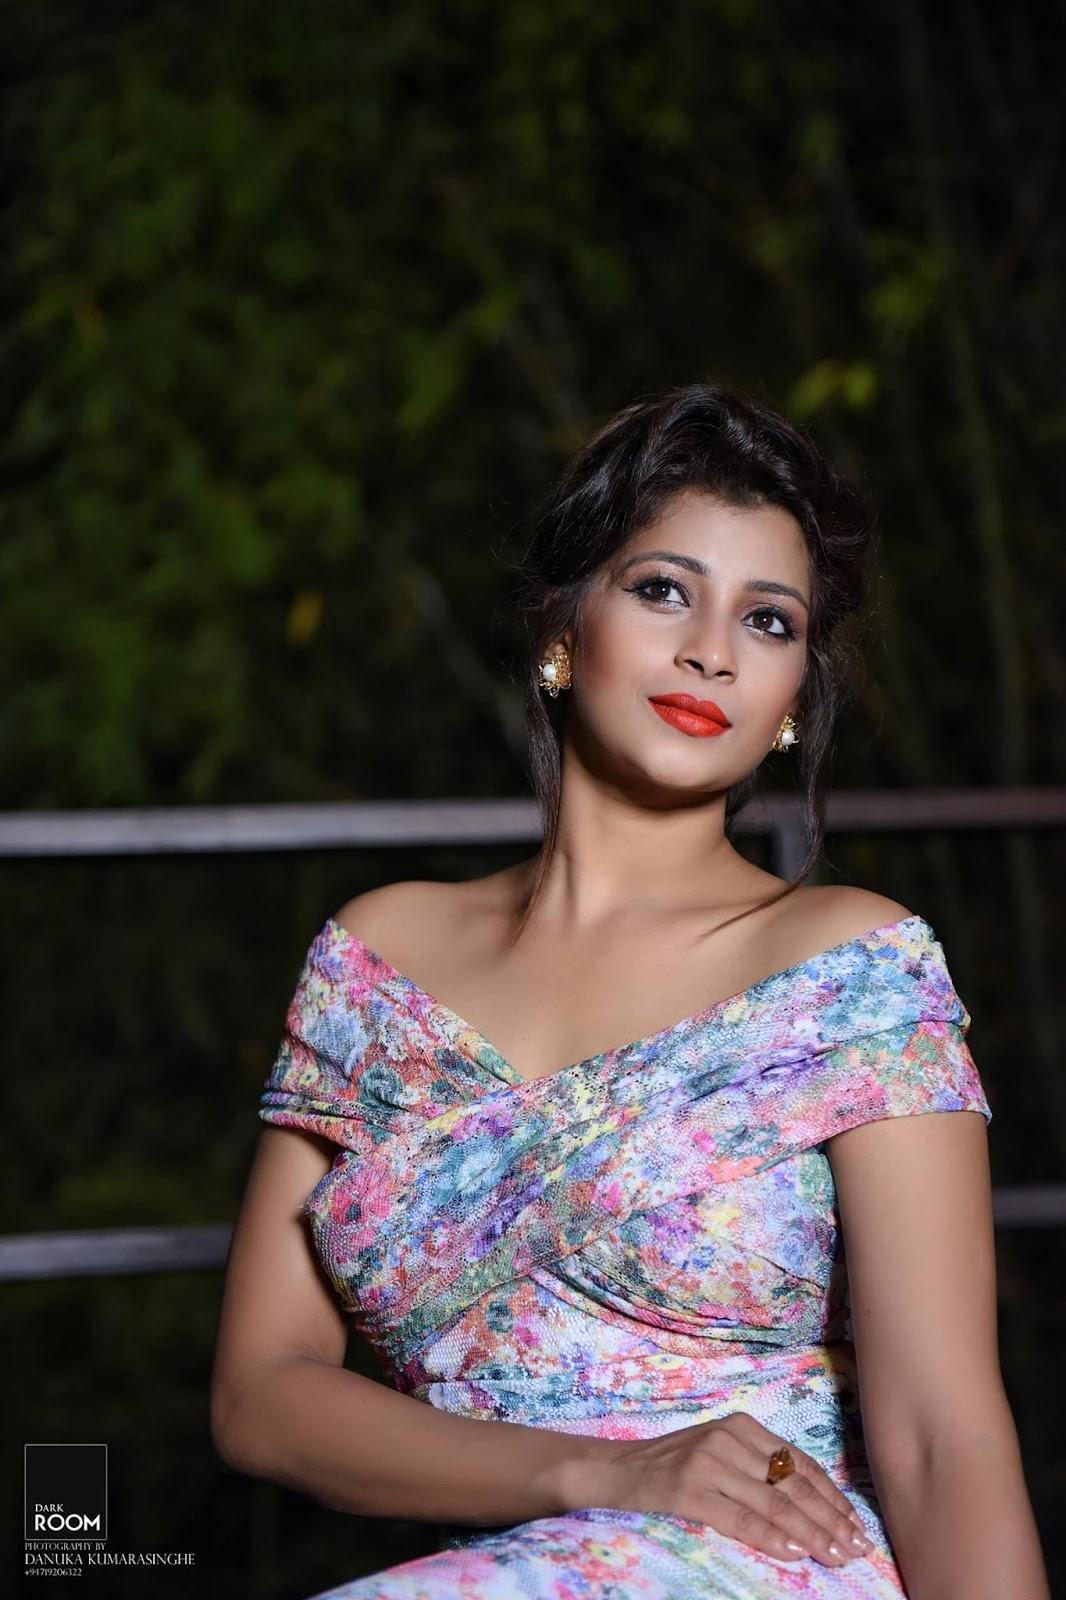 Nadeesha Hemamali | Sri Lanka Hot Picture Gallery.